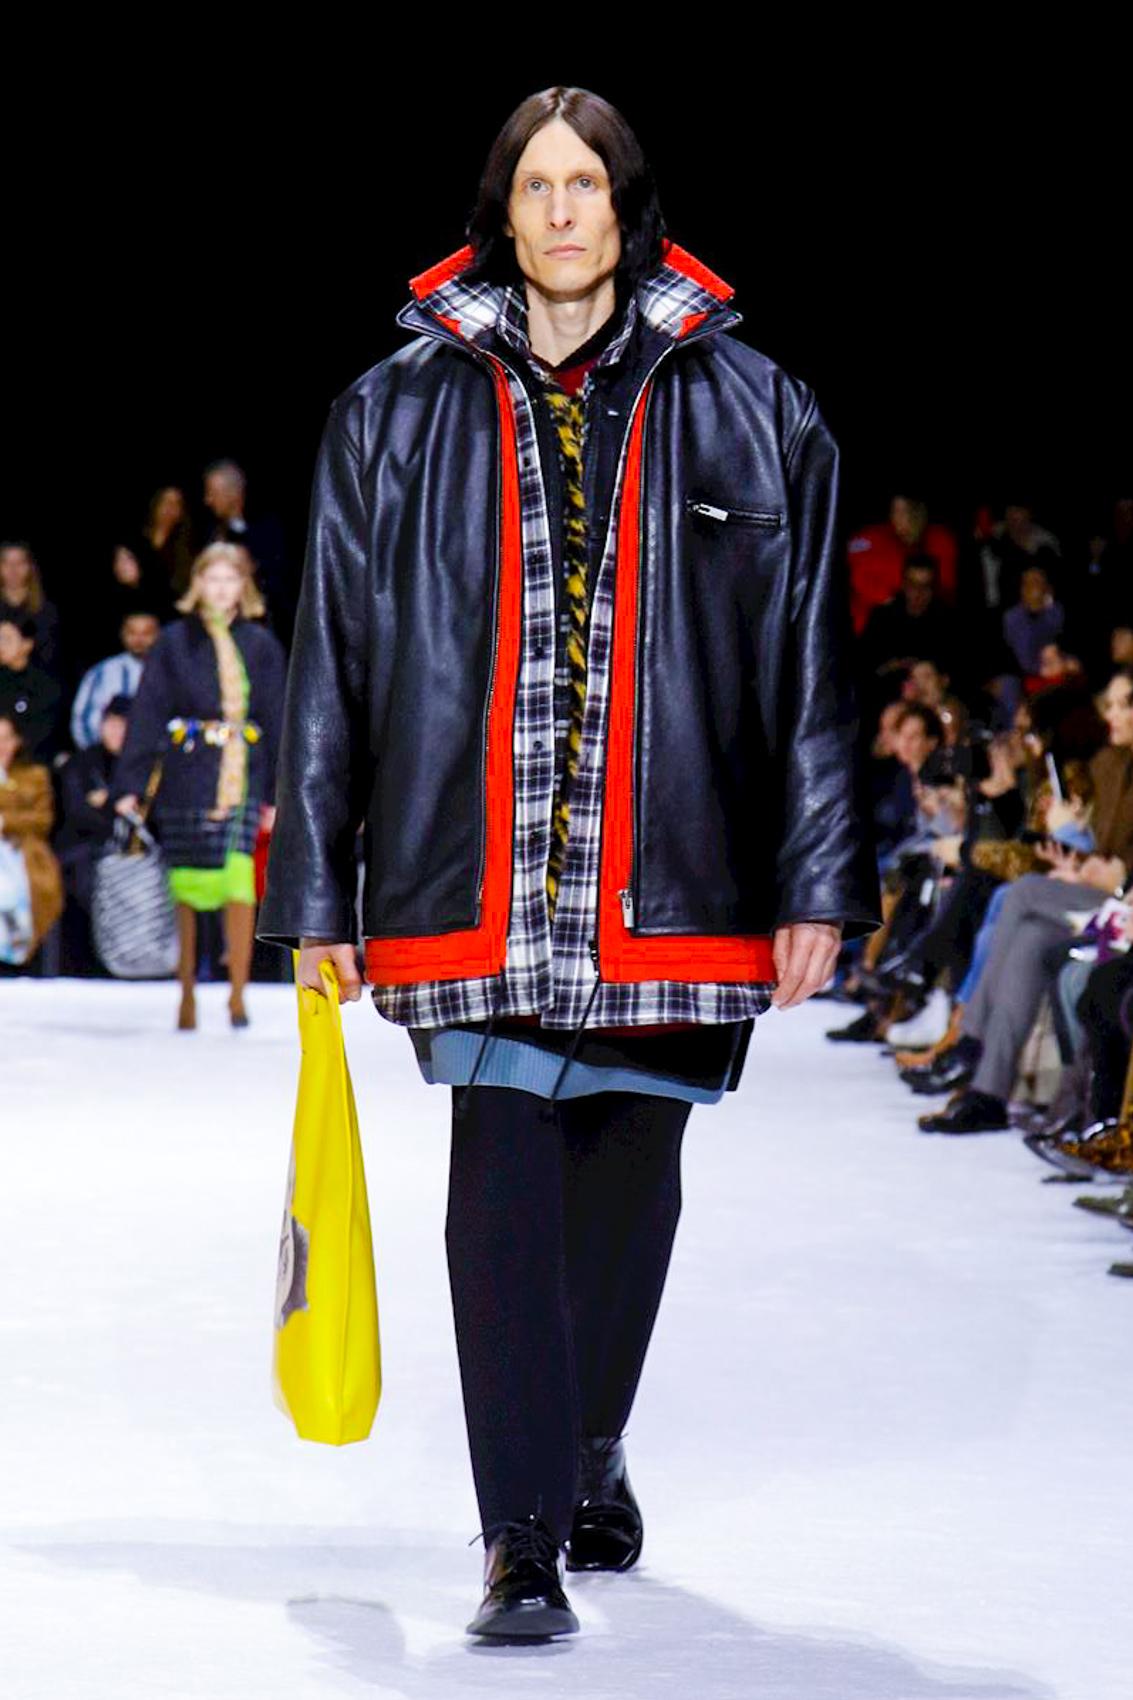 precio atractivo en pies tiros de ahorros fantásticos Balenciaga AW18 Runway Collection (Paris Fashion Week)